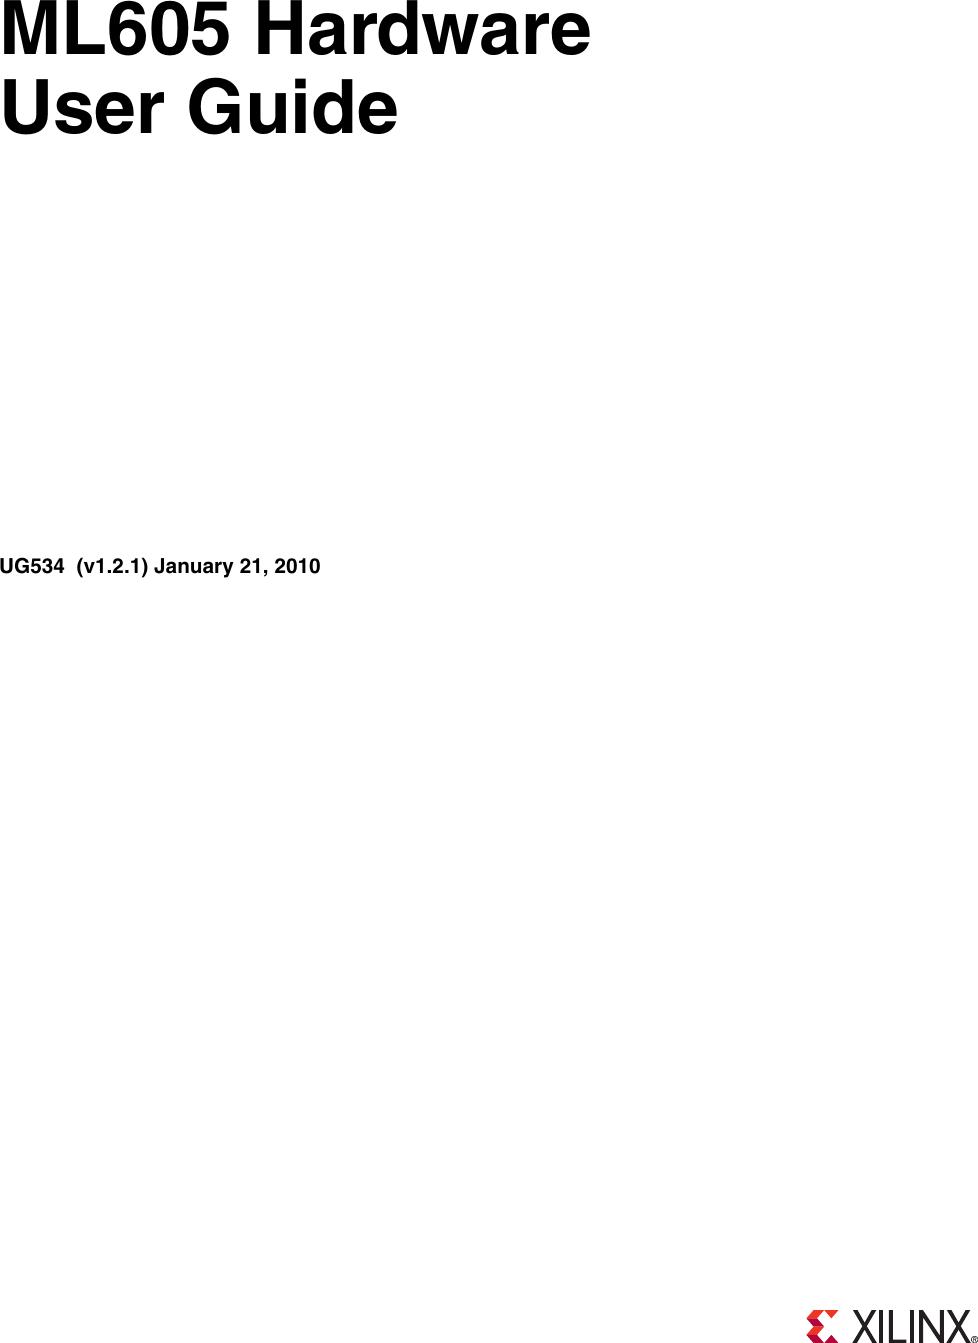 Xilinx Ml605 Users Manual UG534 Hardware, User Guide on